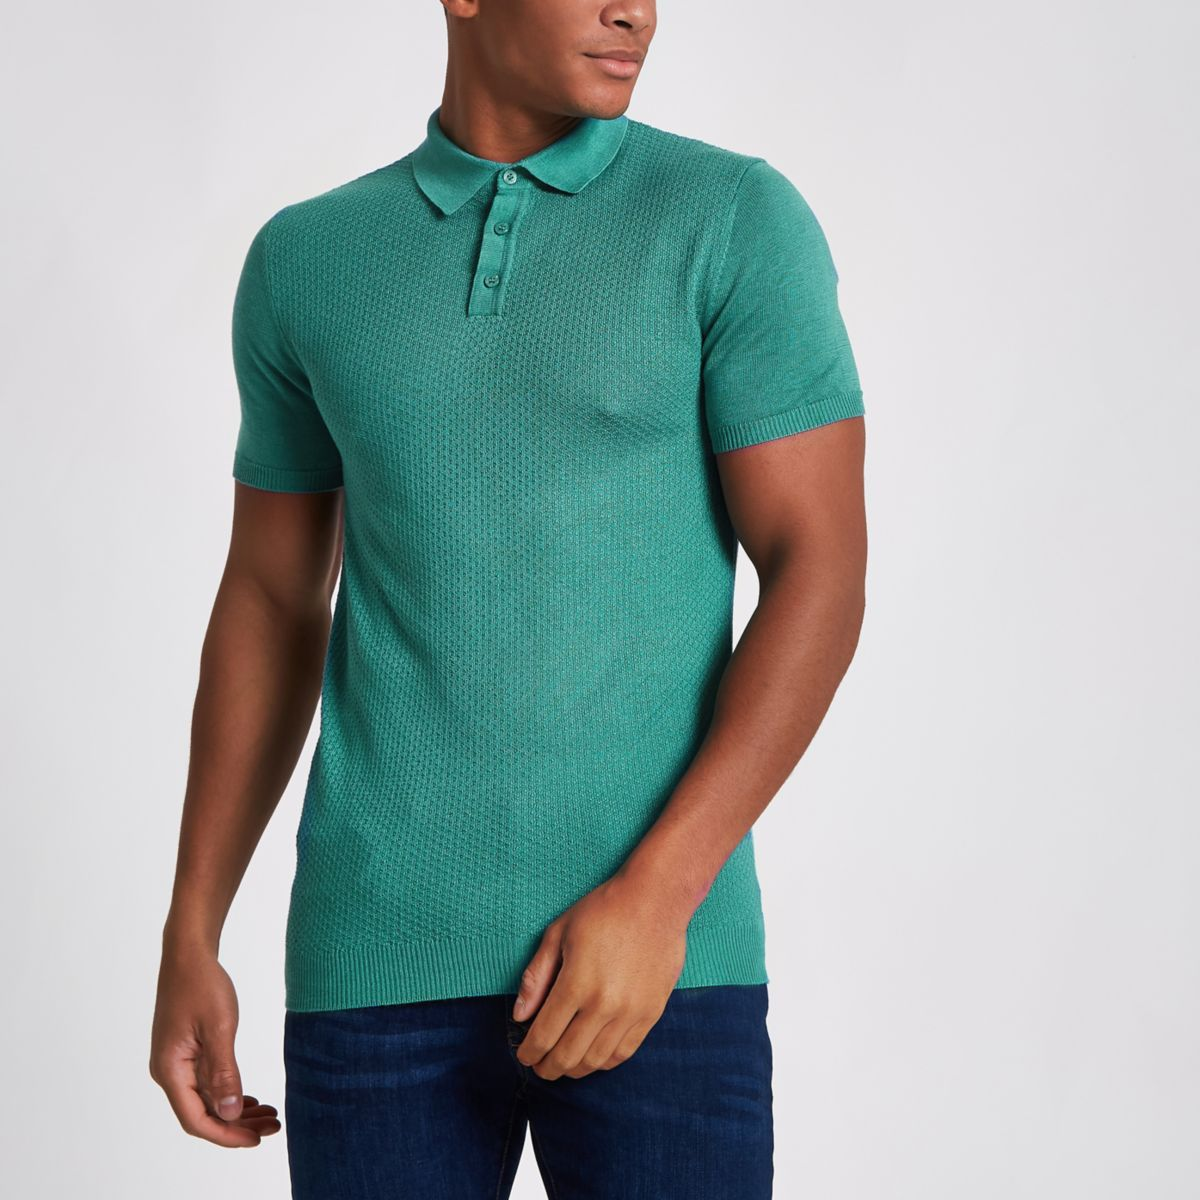 polo muscle fit textured shirt Green qtCfawxn